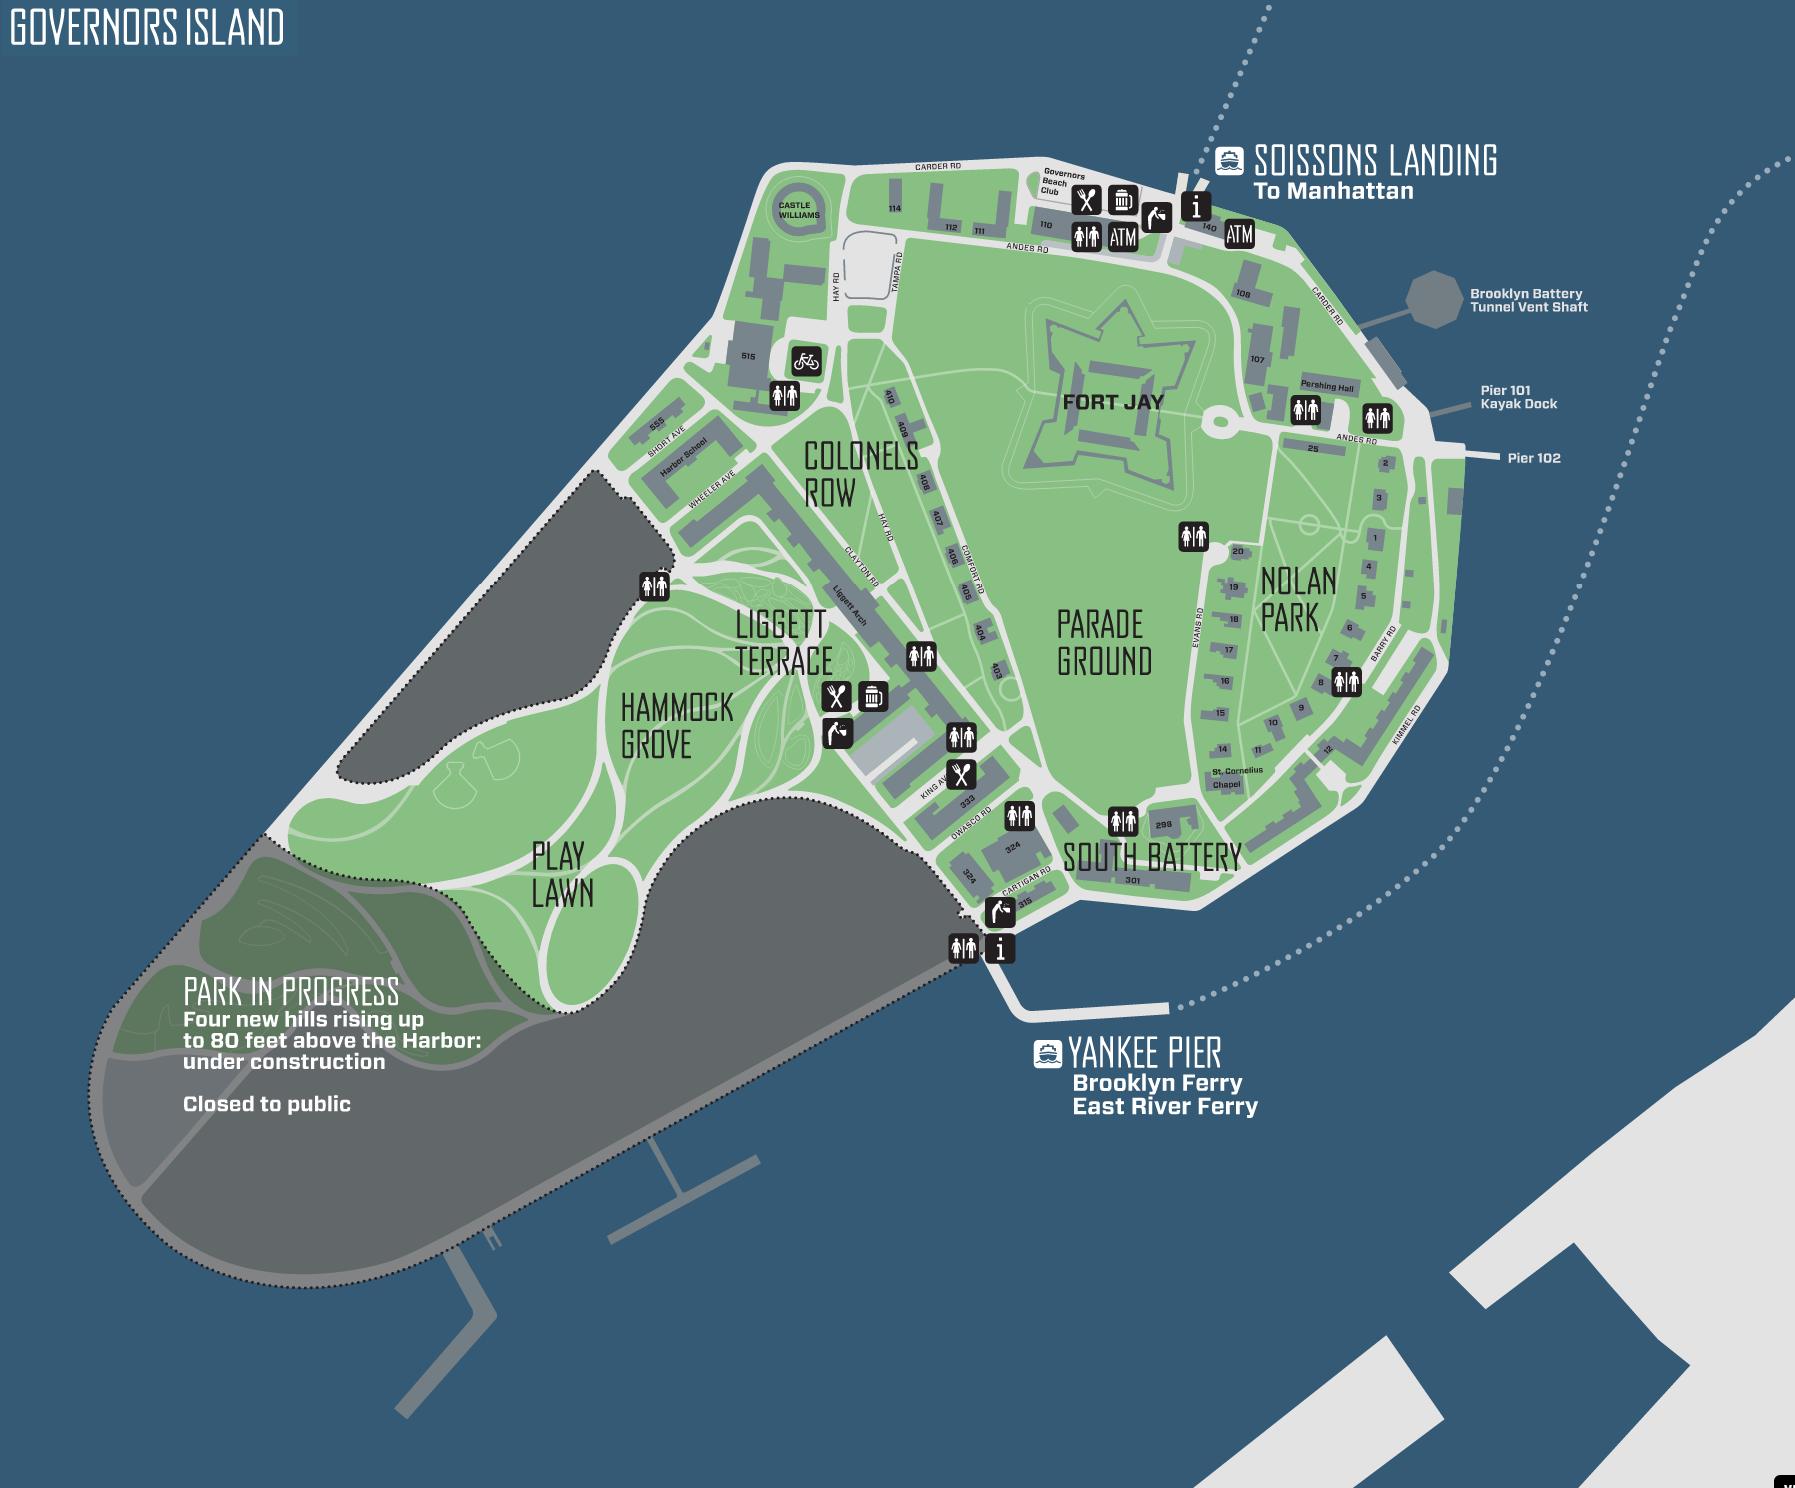 Governors Island Bike Map